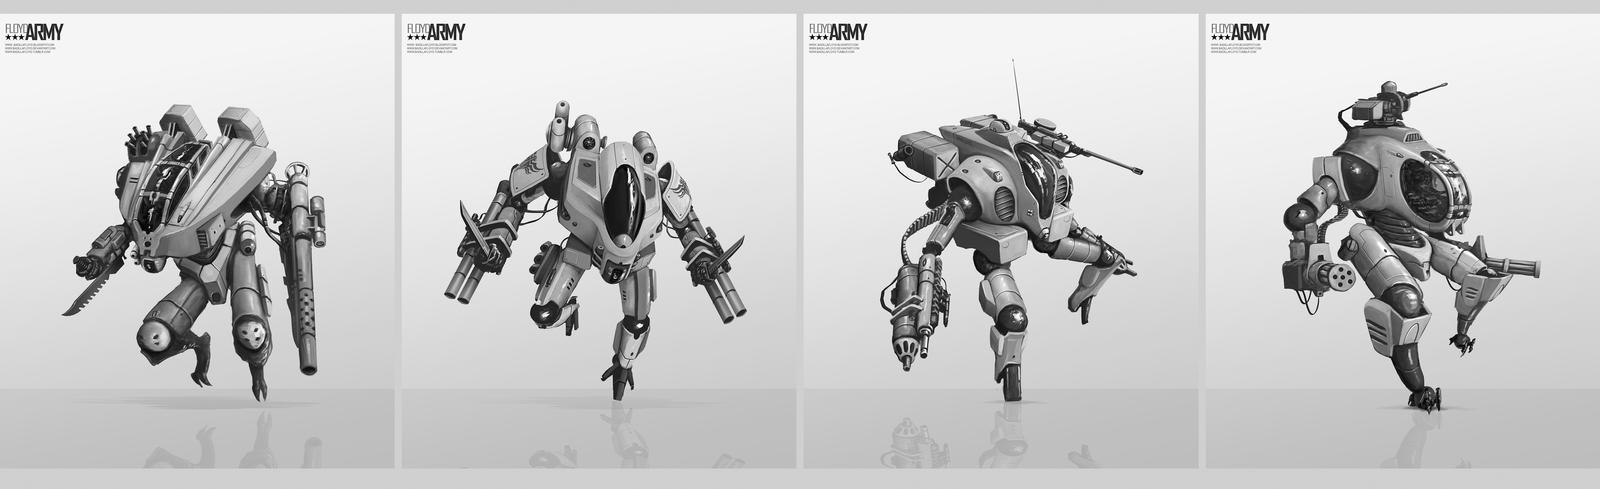 Robots Concepts by badillafloyd